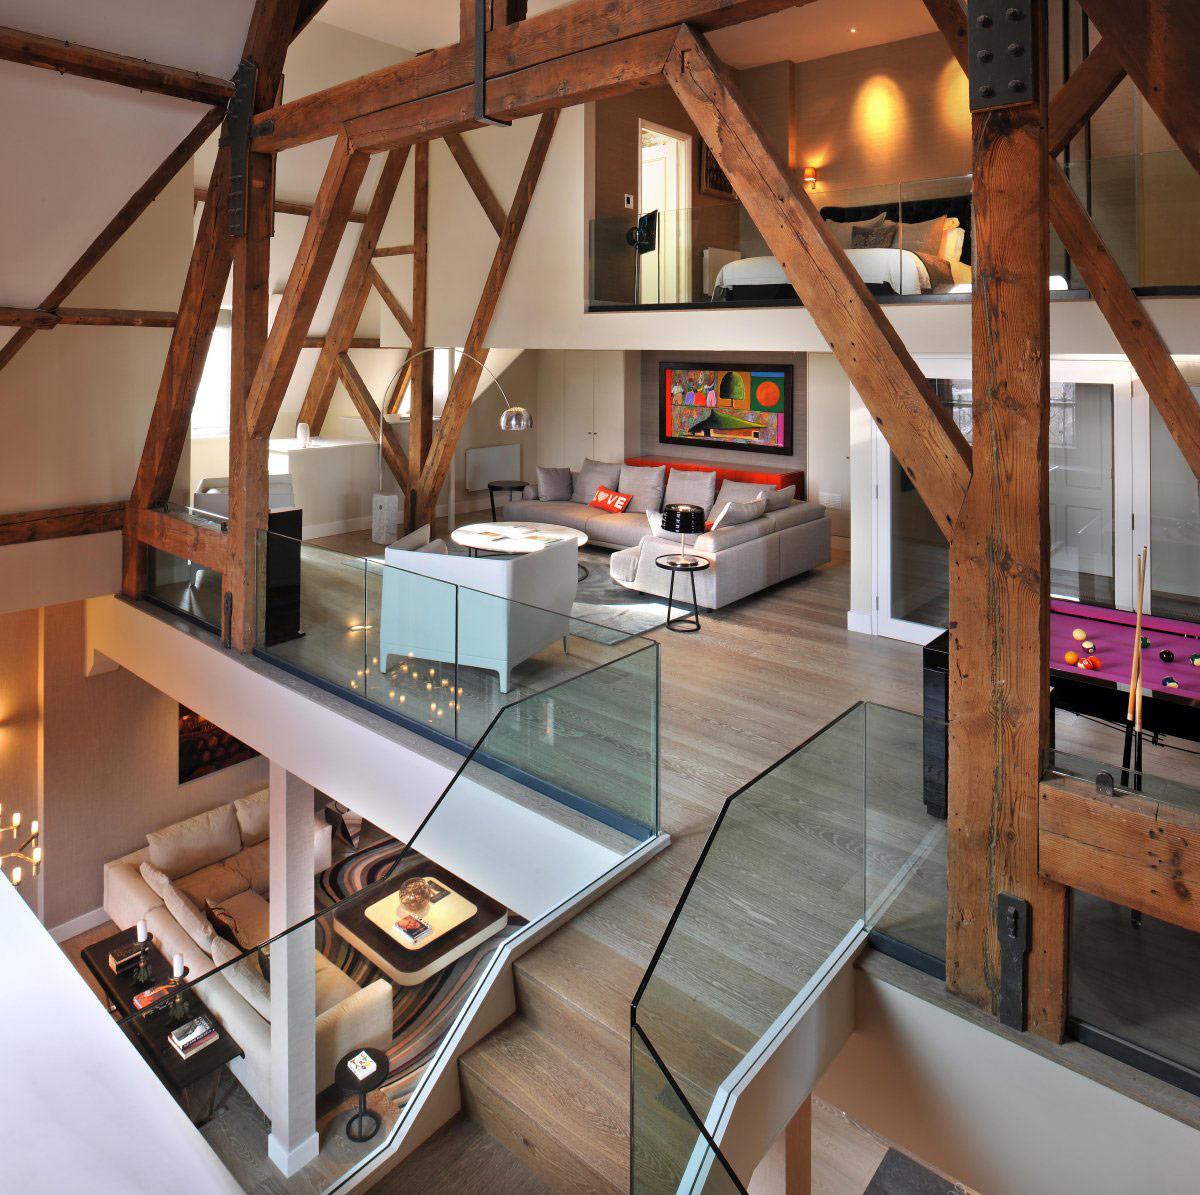 St Pancras Penthouse Apartment in London